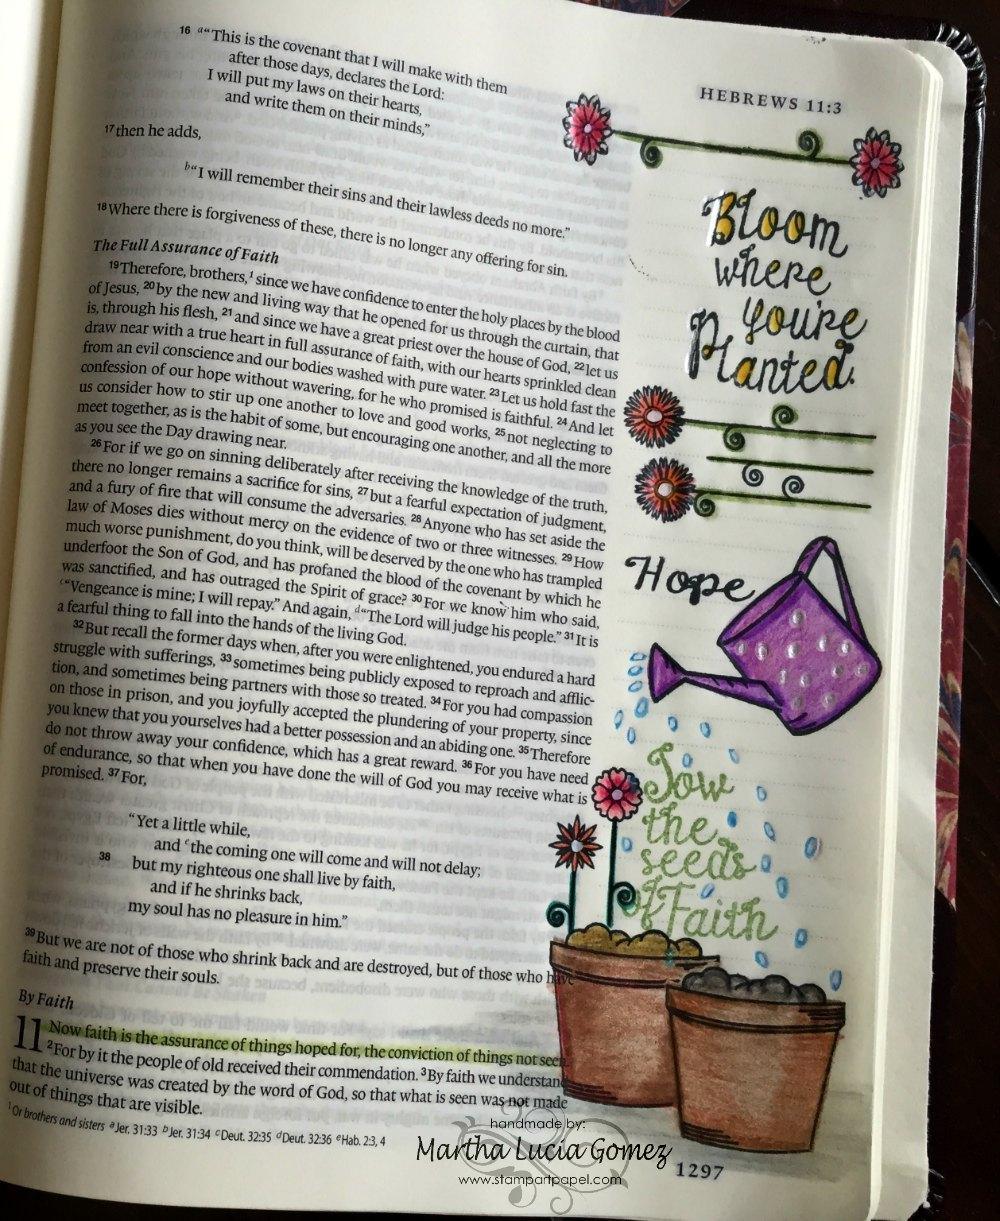 CRECIENDO EN LA FE O GROW WITH FAITH